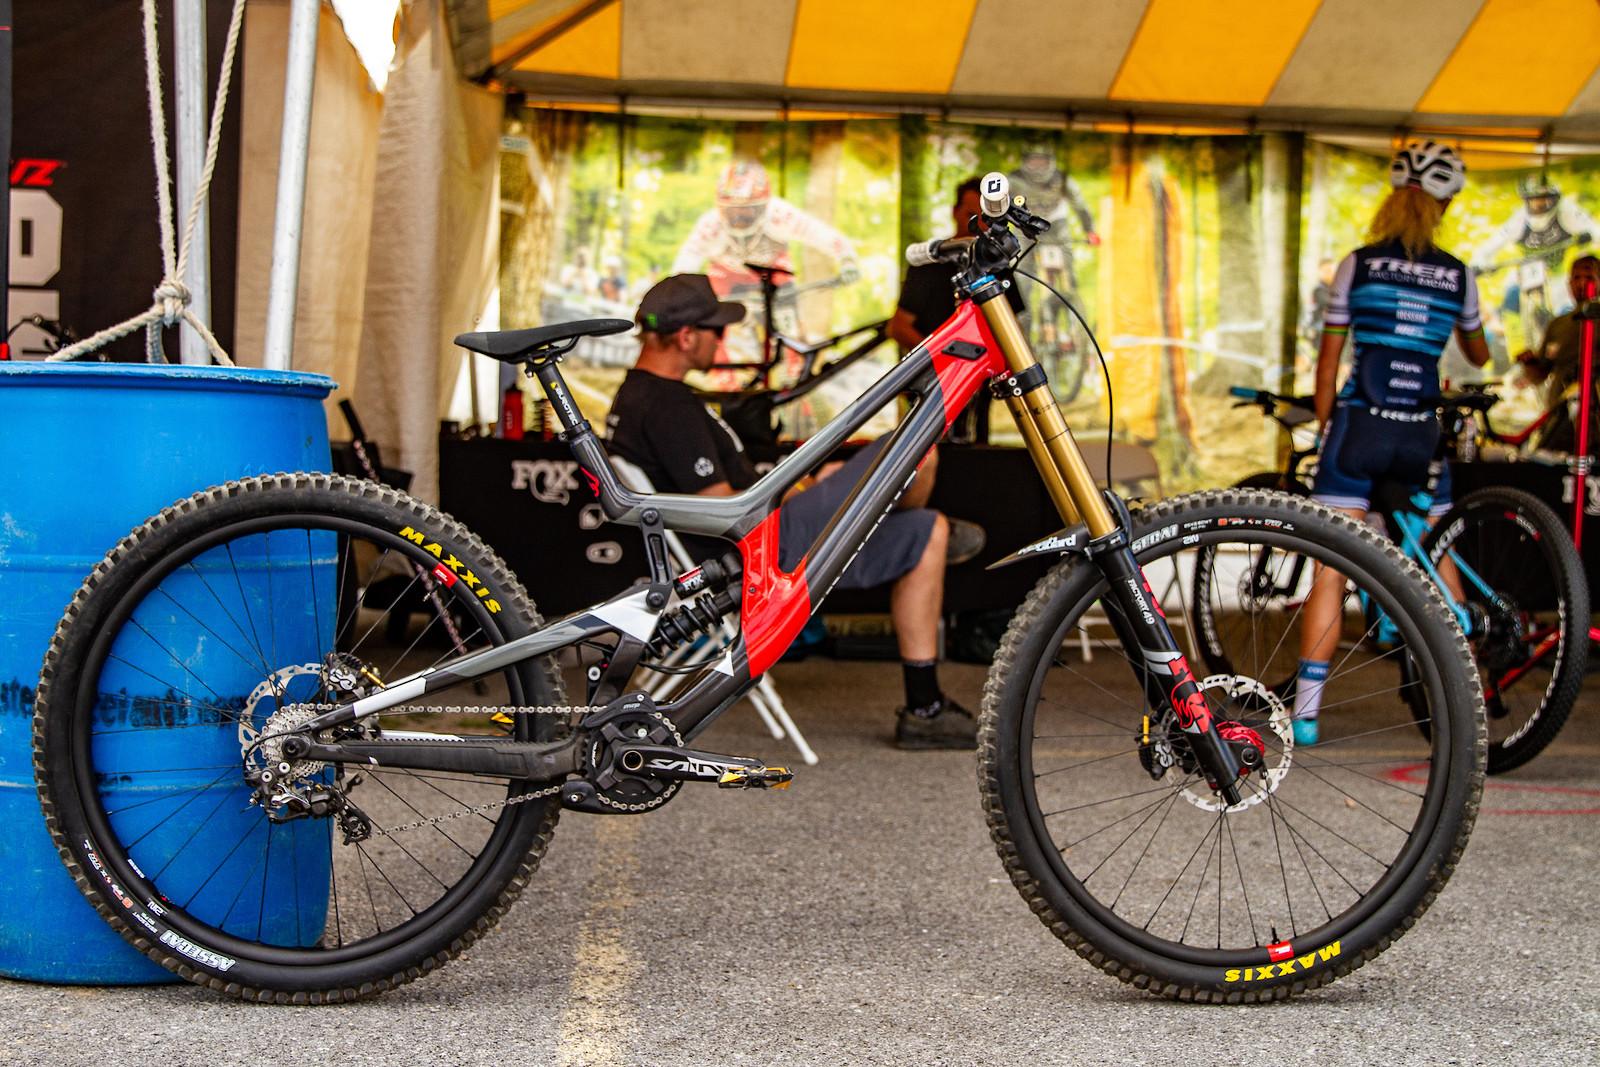 Luca Shaw's Santa Cruz V10 CC. - JackRice - Mountain Biking Pictures - Vital MTB